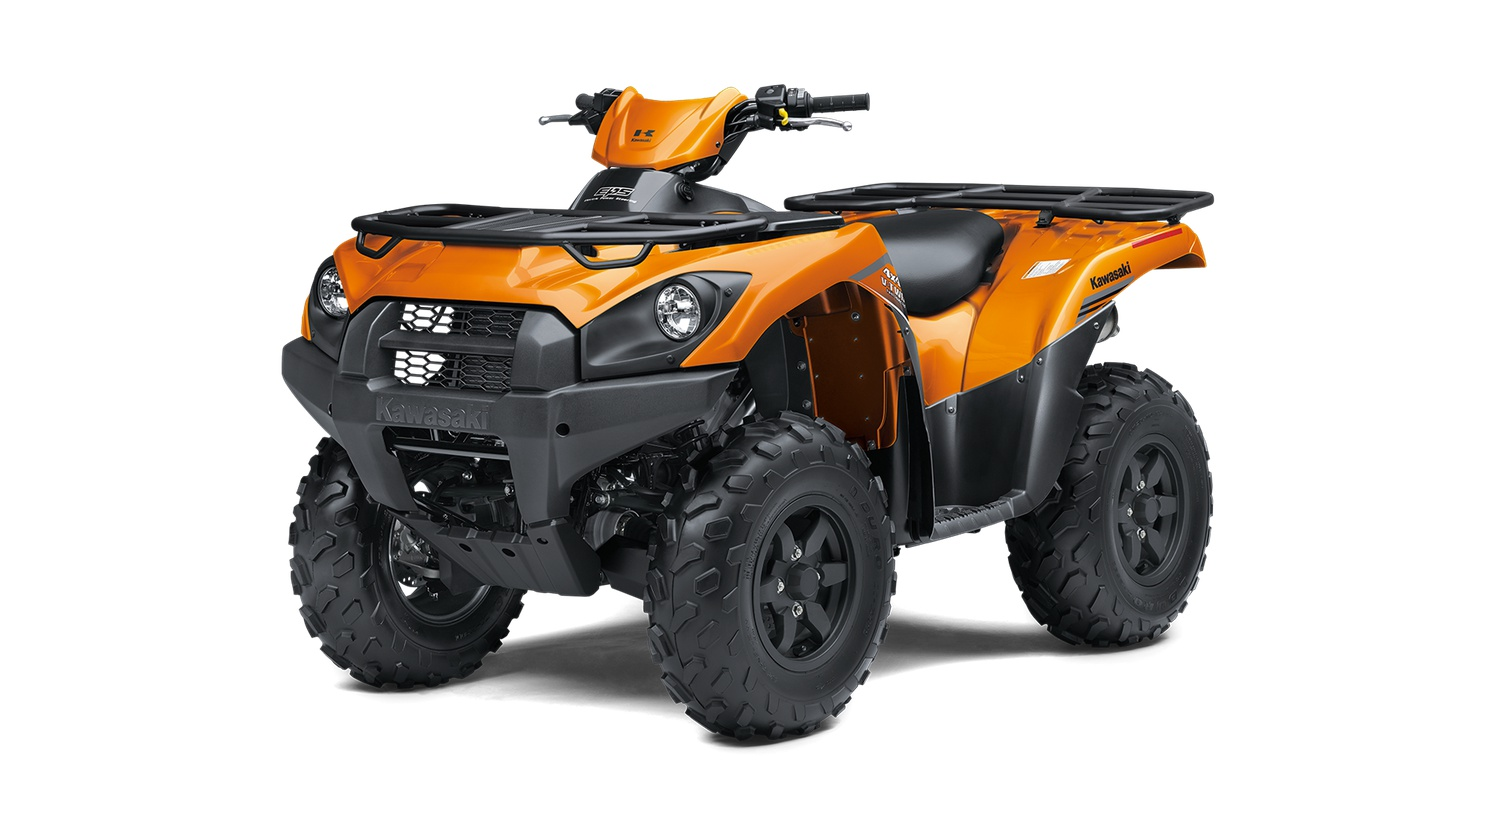 Kawasaki BRUTE FORCE 750 4x4i EPS Orange Nacré Fournaise F'Acier 2020